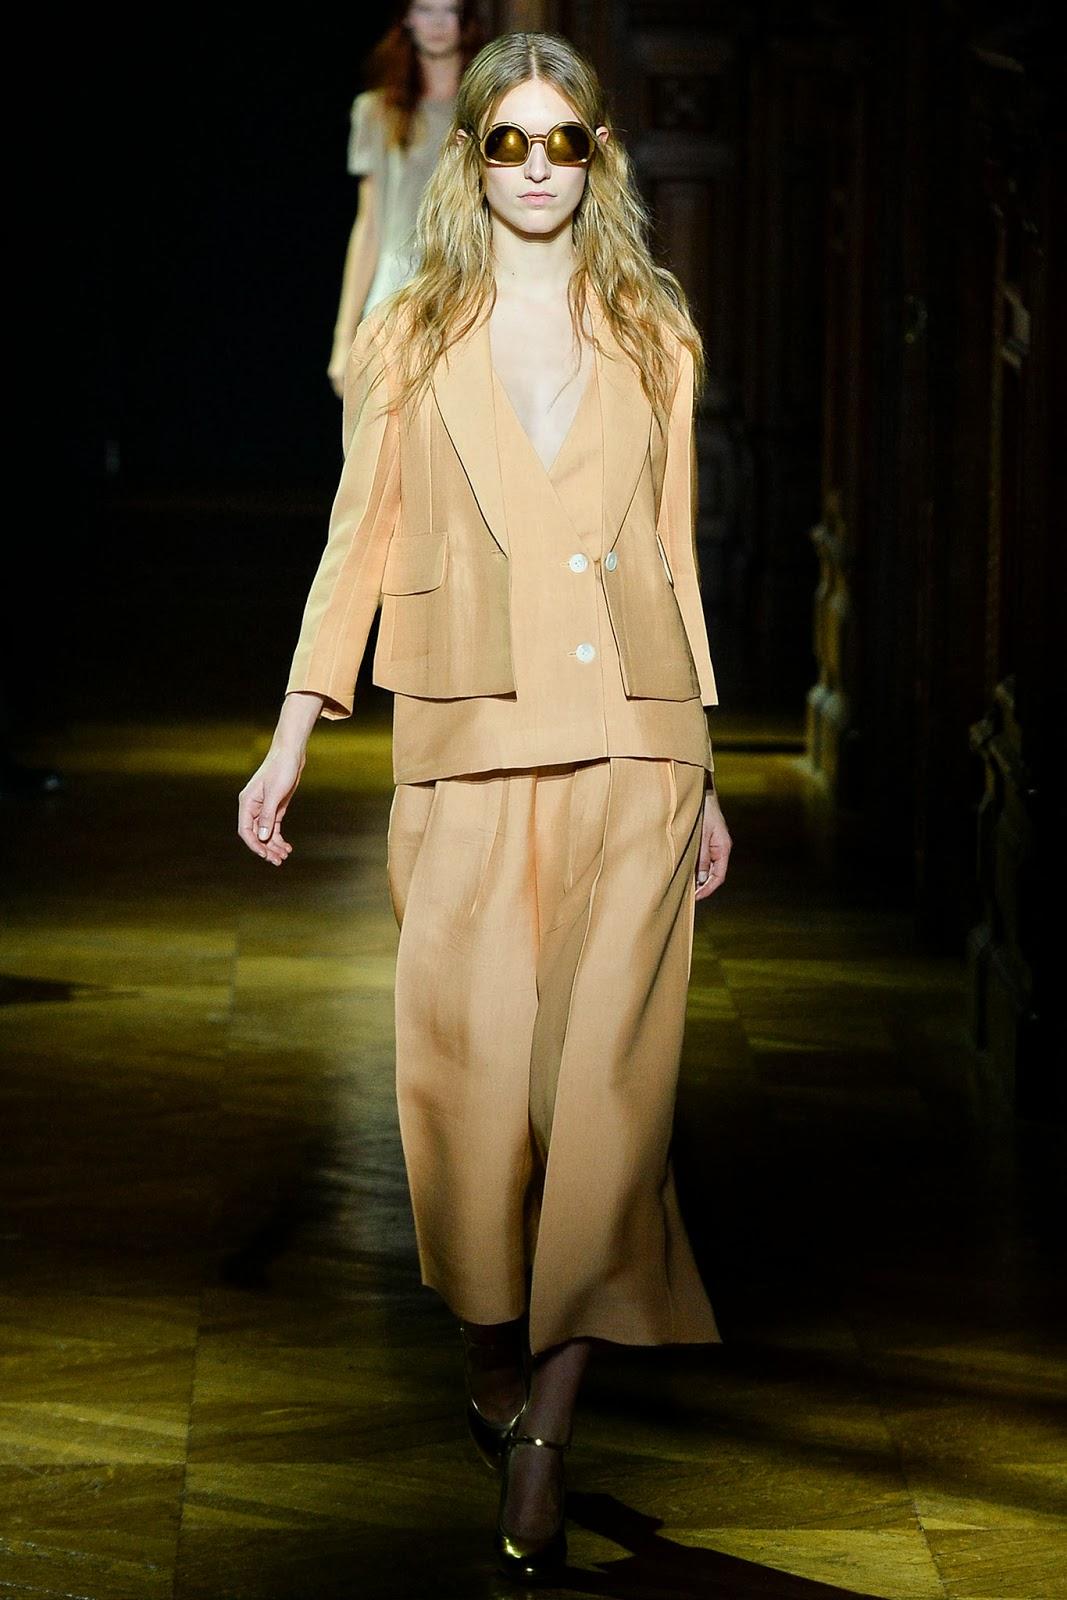 b6369fa3bc sonia rykiel s/s 14 paris | visual optimism; fashion editorials, shows,  campaigns & more!